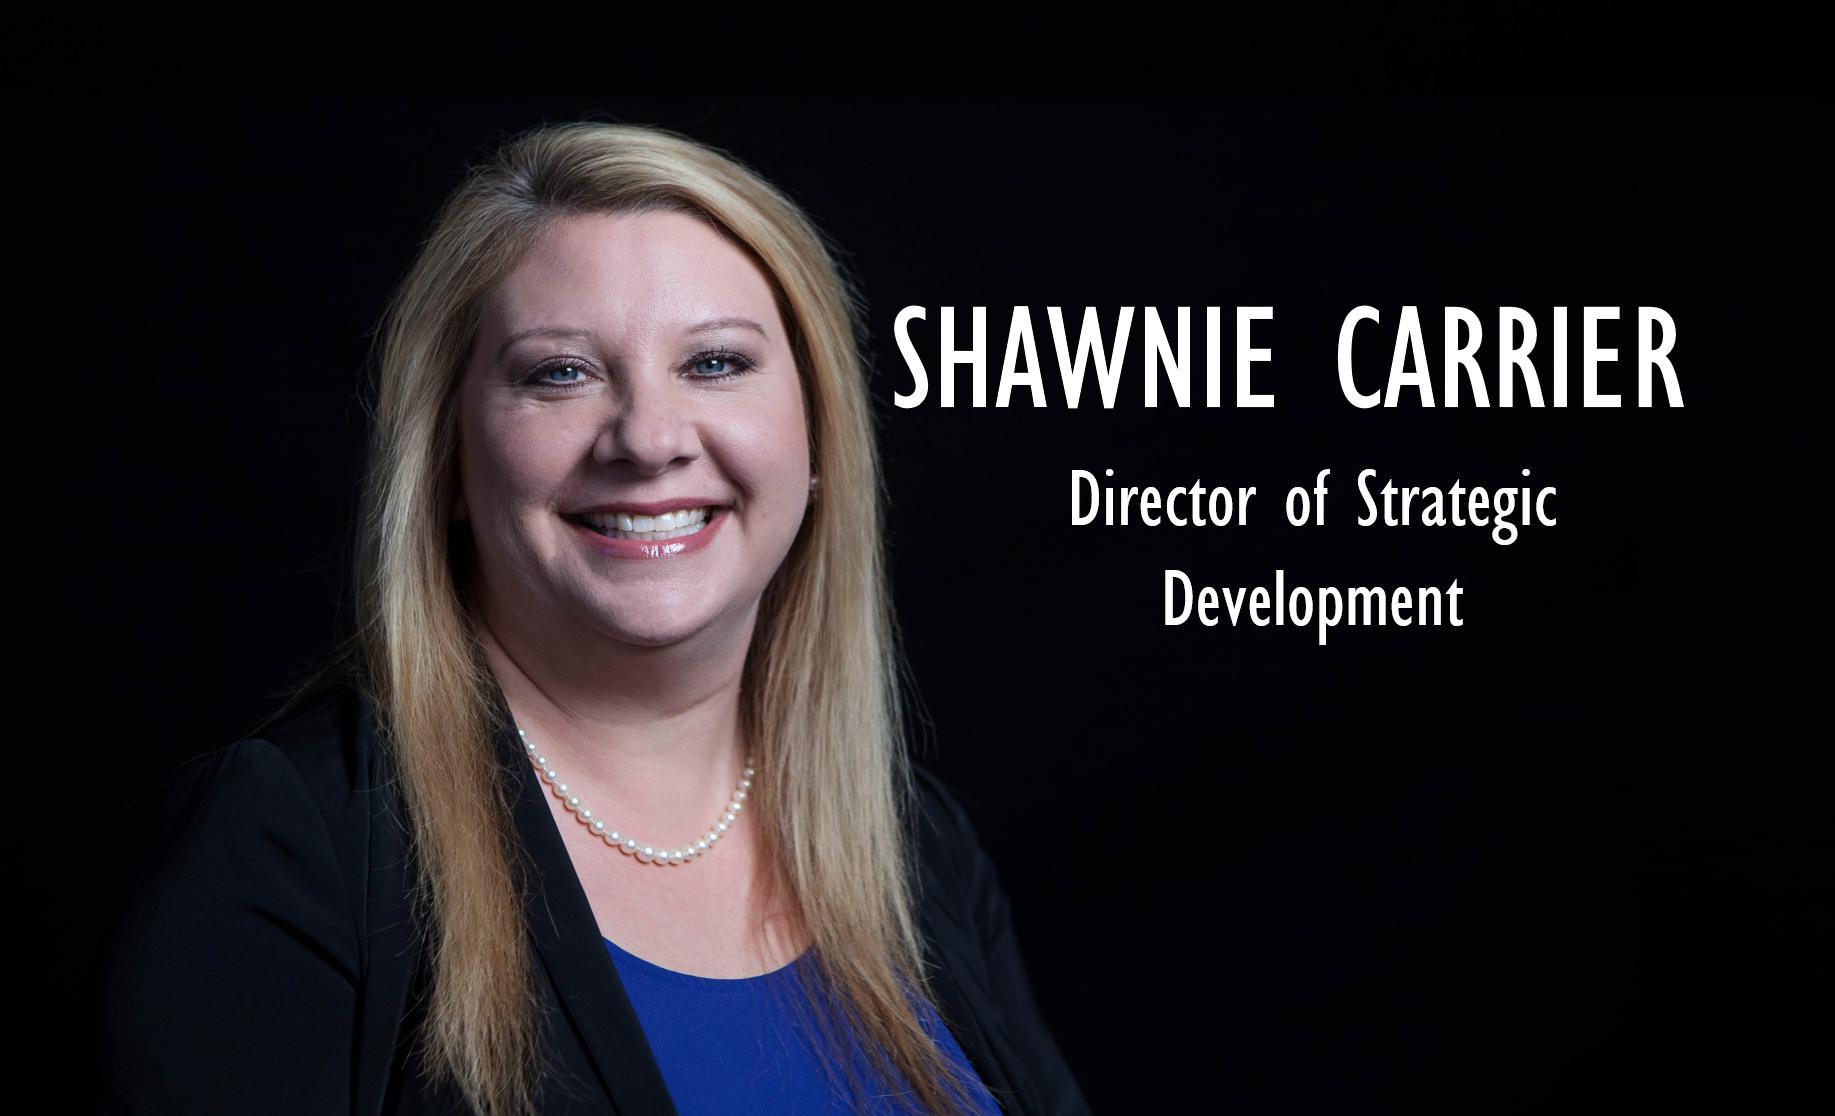 Shawnie Carrier